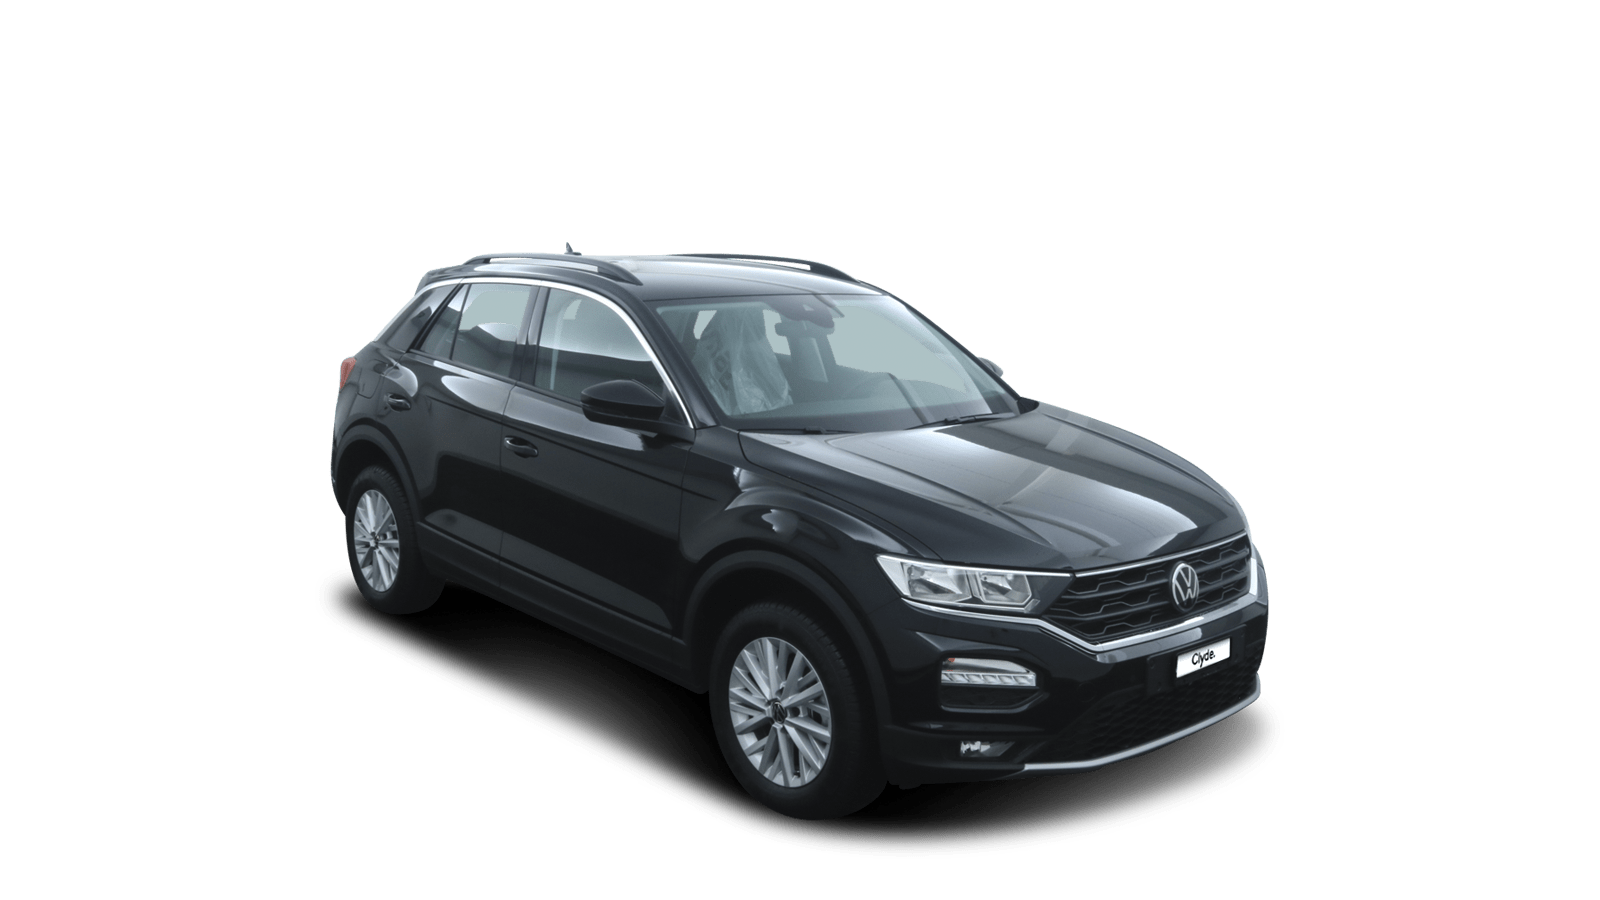 VW T-Roc Schwarz front - Clyde Auto-Abo